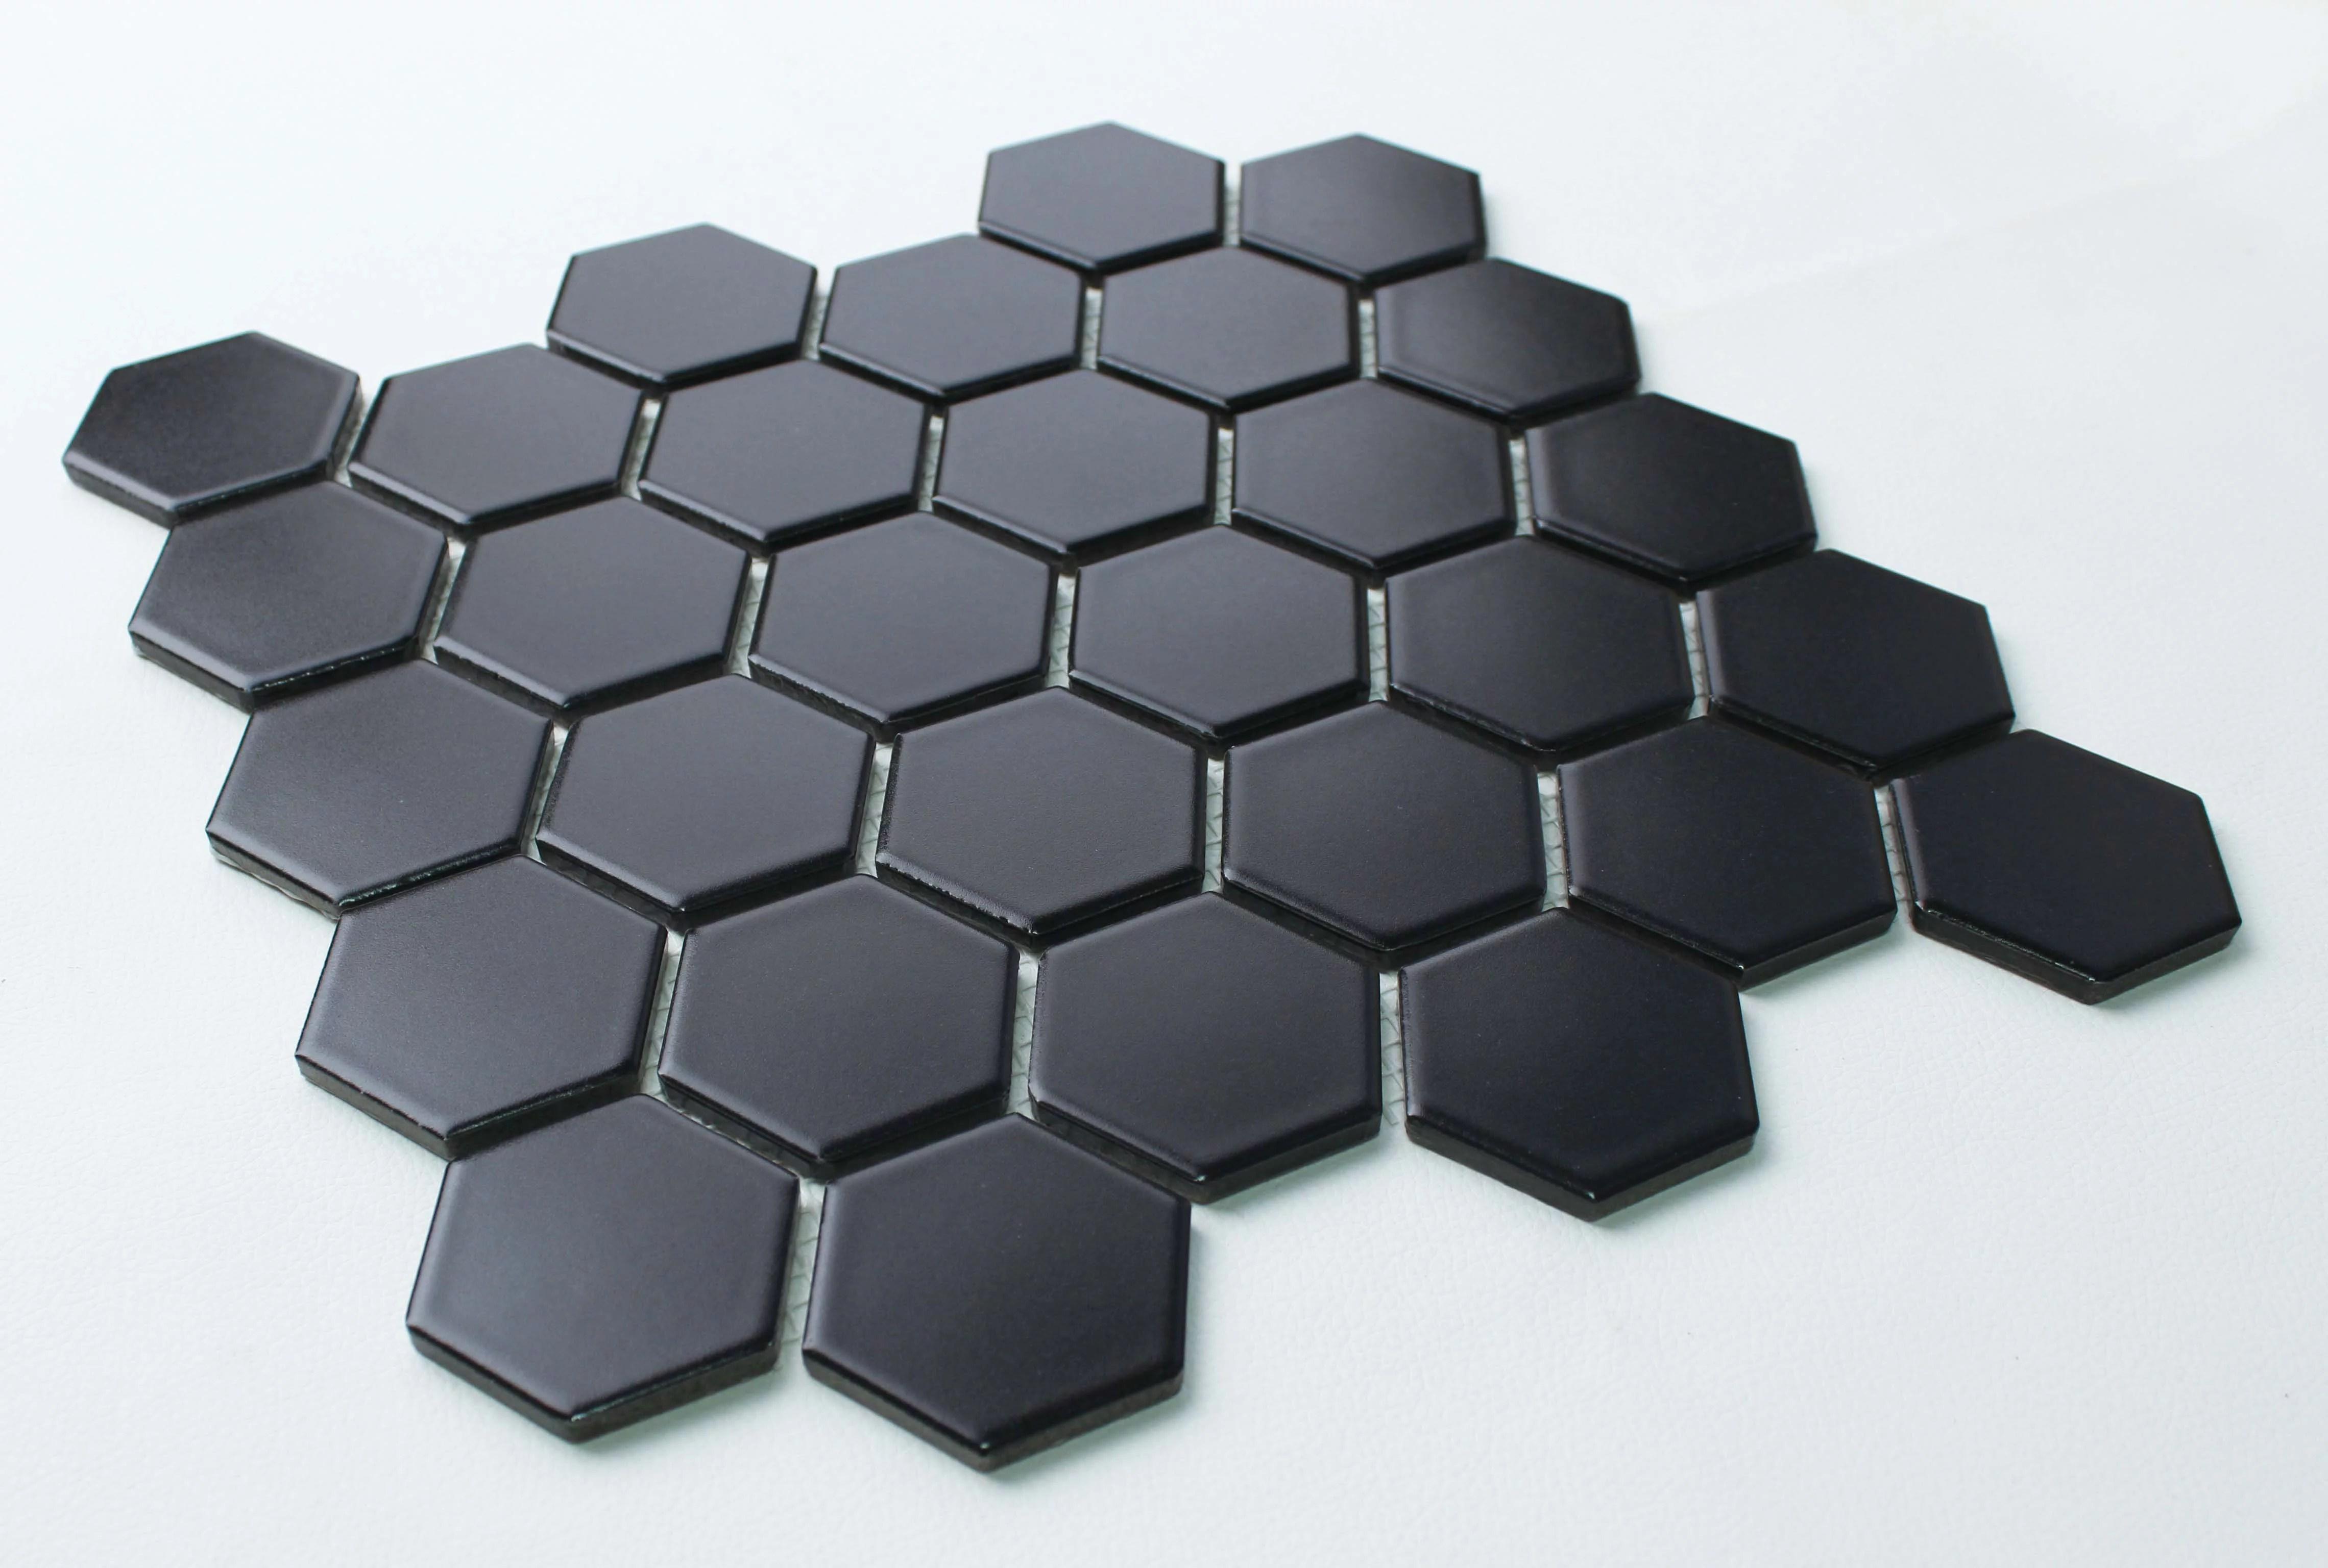 ws tiles value matte black 10 5 in x 10 5 in porcelain 2 hexagon mosaic floor wall tile 9 sq ft case walmart com